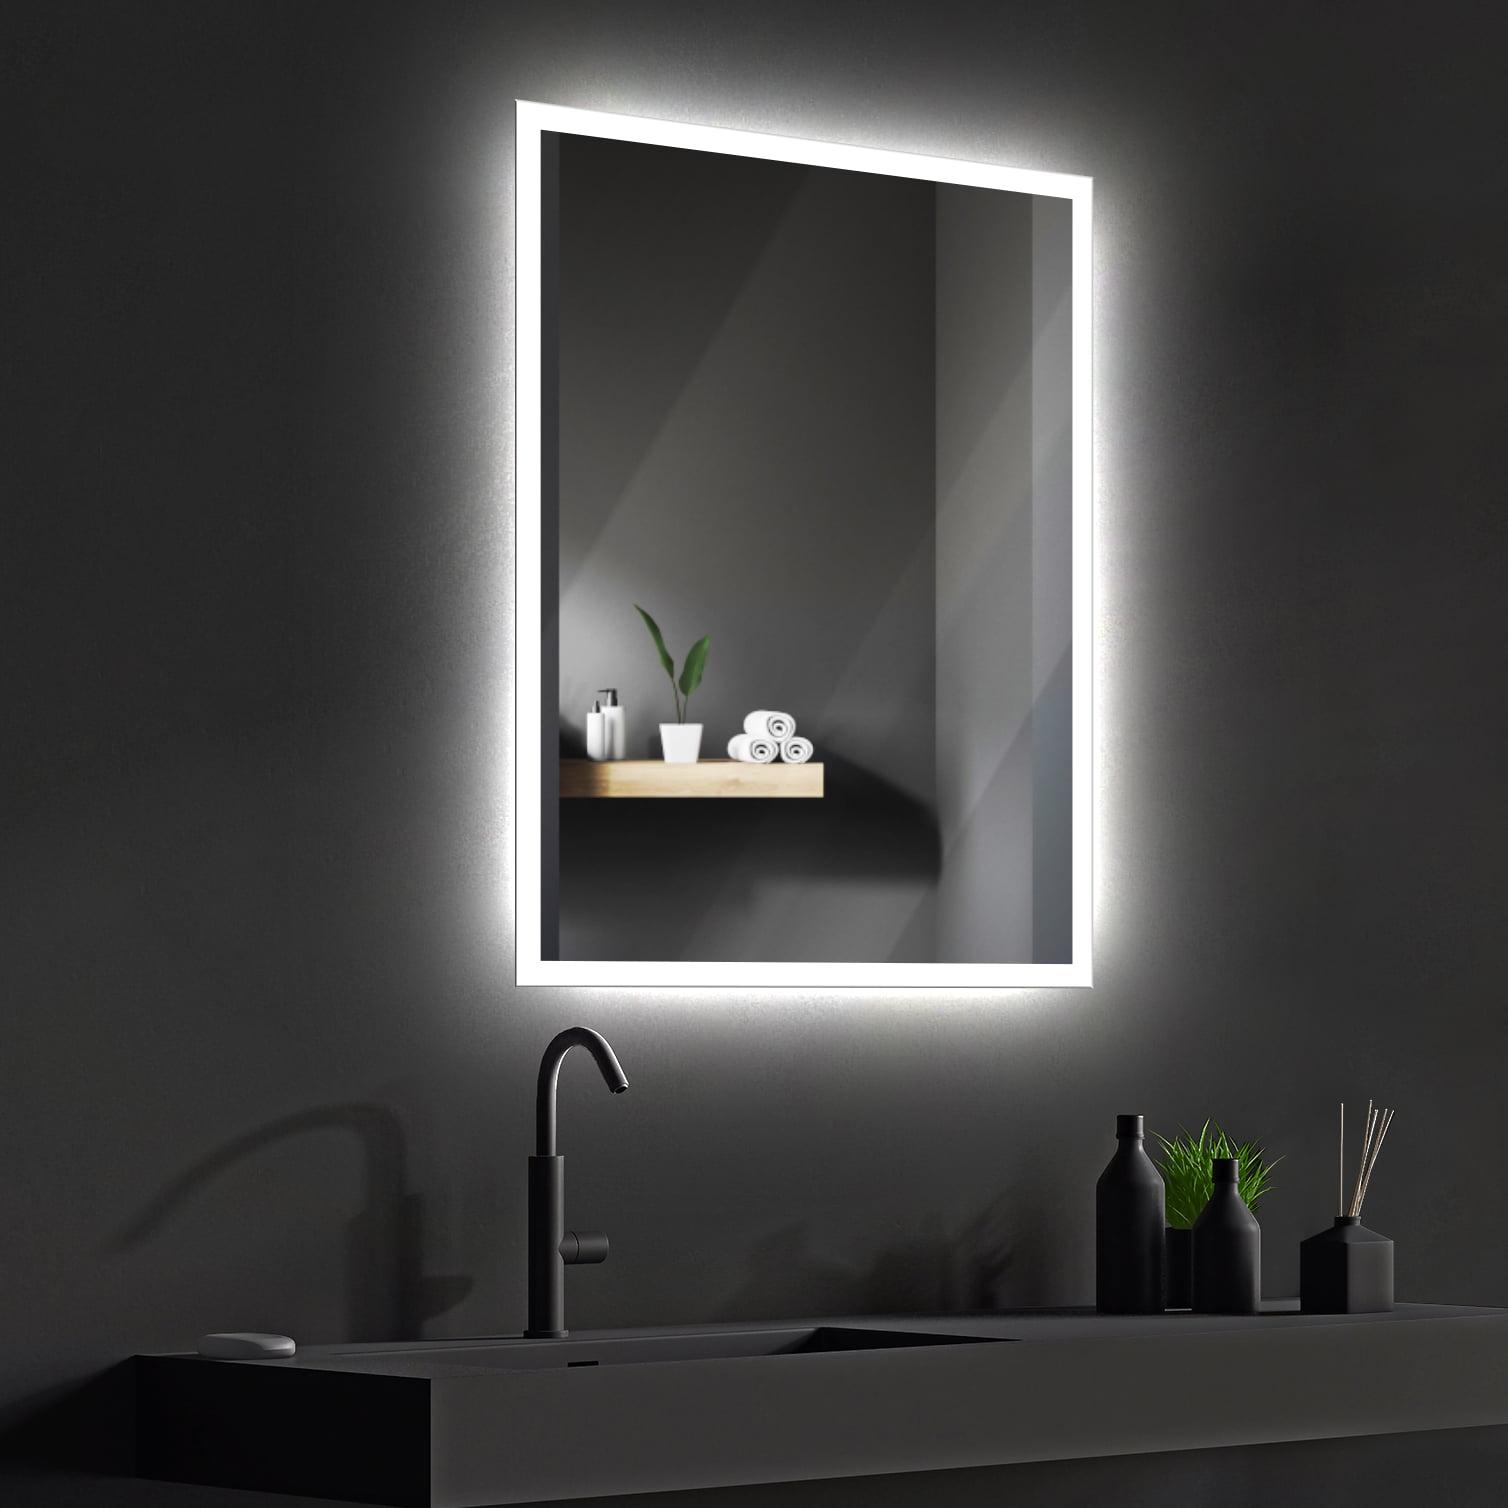 LED OGLEDALO 667988 VENUS